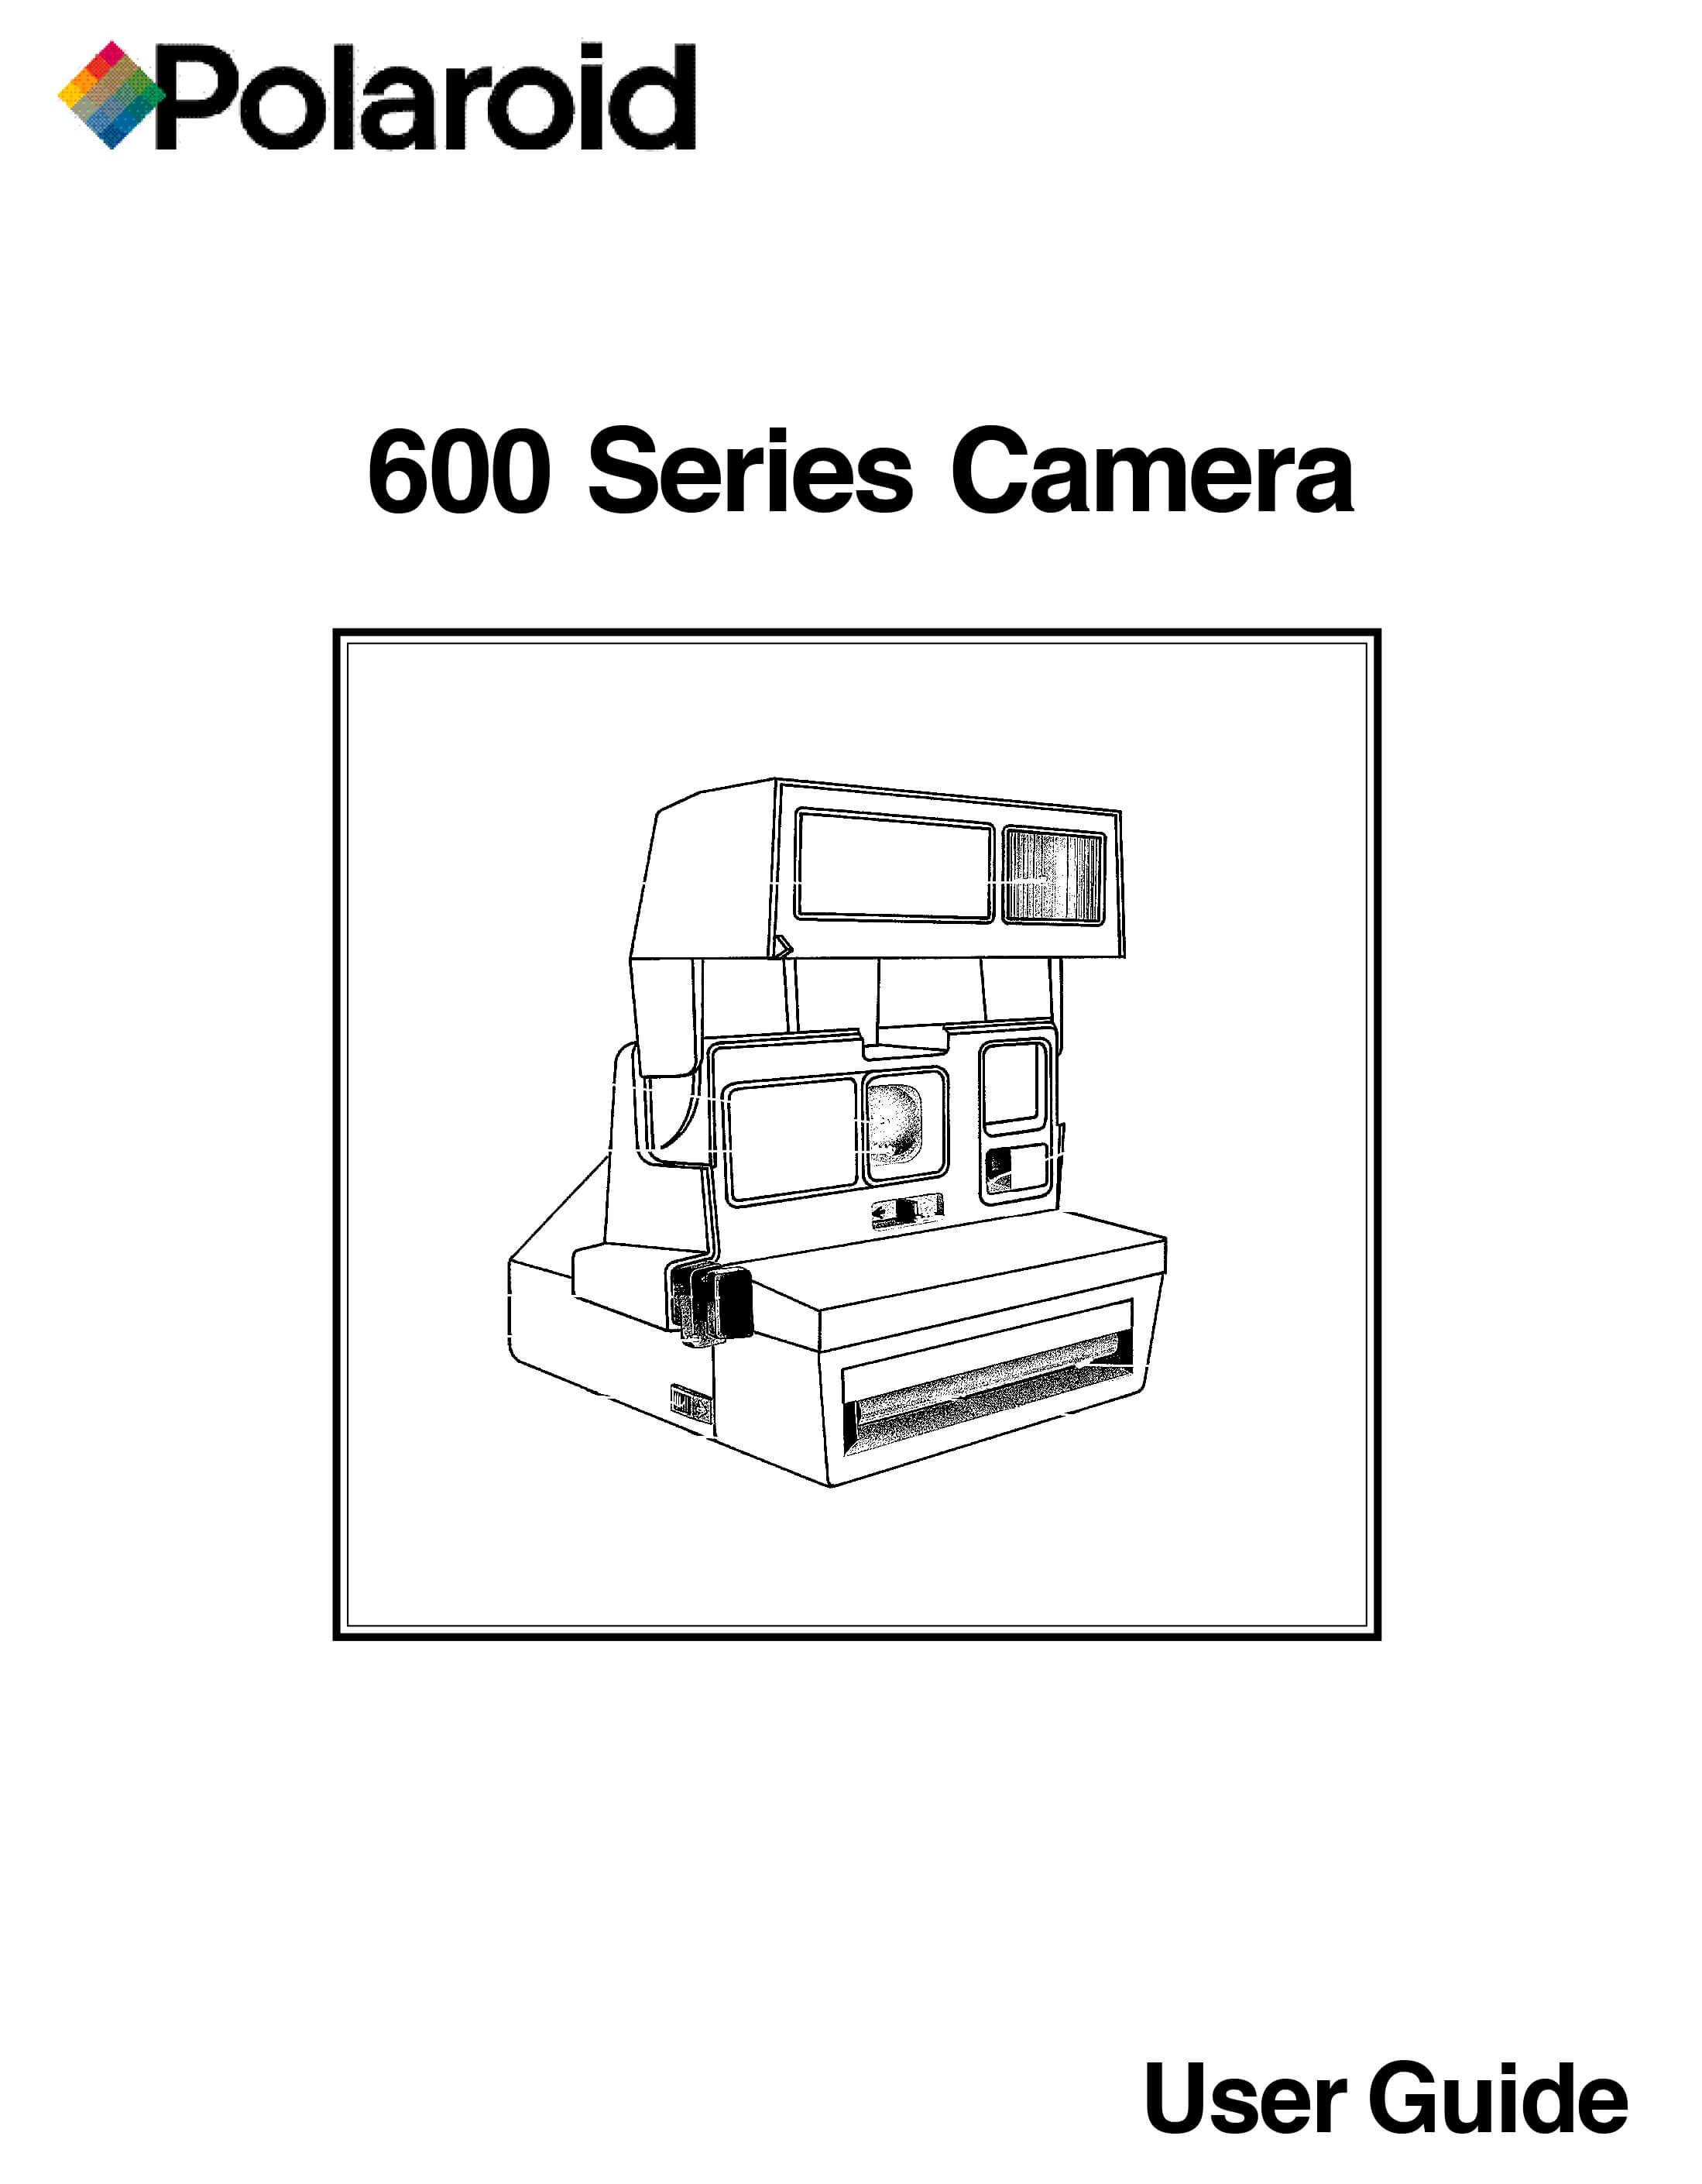 polaroid 600 series camera user guide instant university rh instant university Polaroid One600 Camera Manual polaroid sun 600 instruction manual